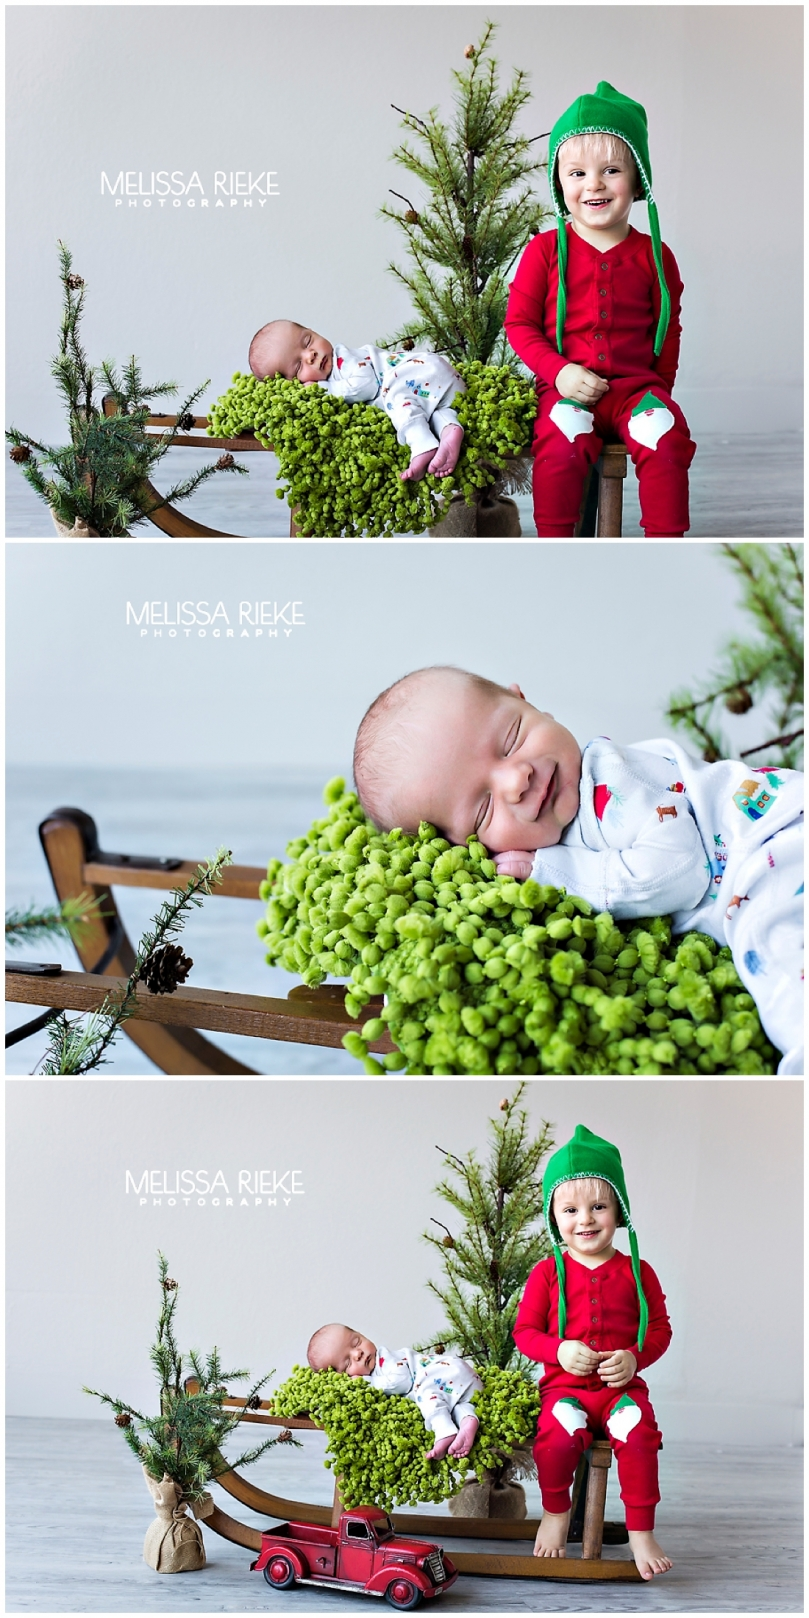 Hanna Andersson Holiday Jammies | Christmas Newborn Pictures | Christmas Pajamas | #HannaJams 2016 | Melissa Rieke Photography